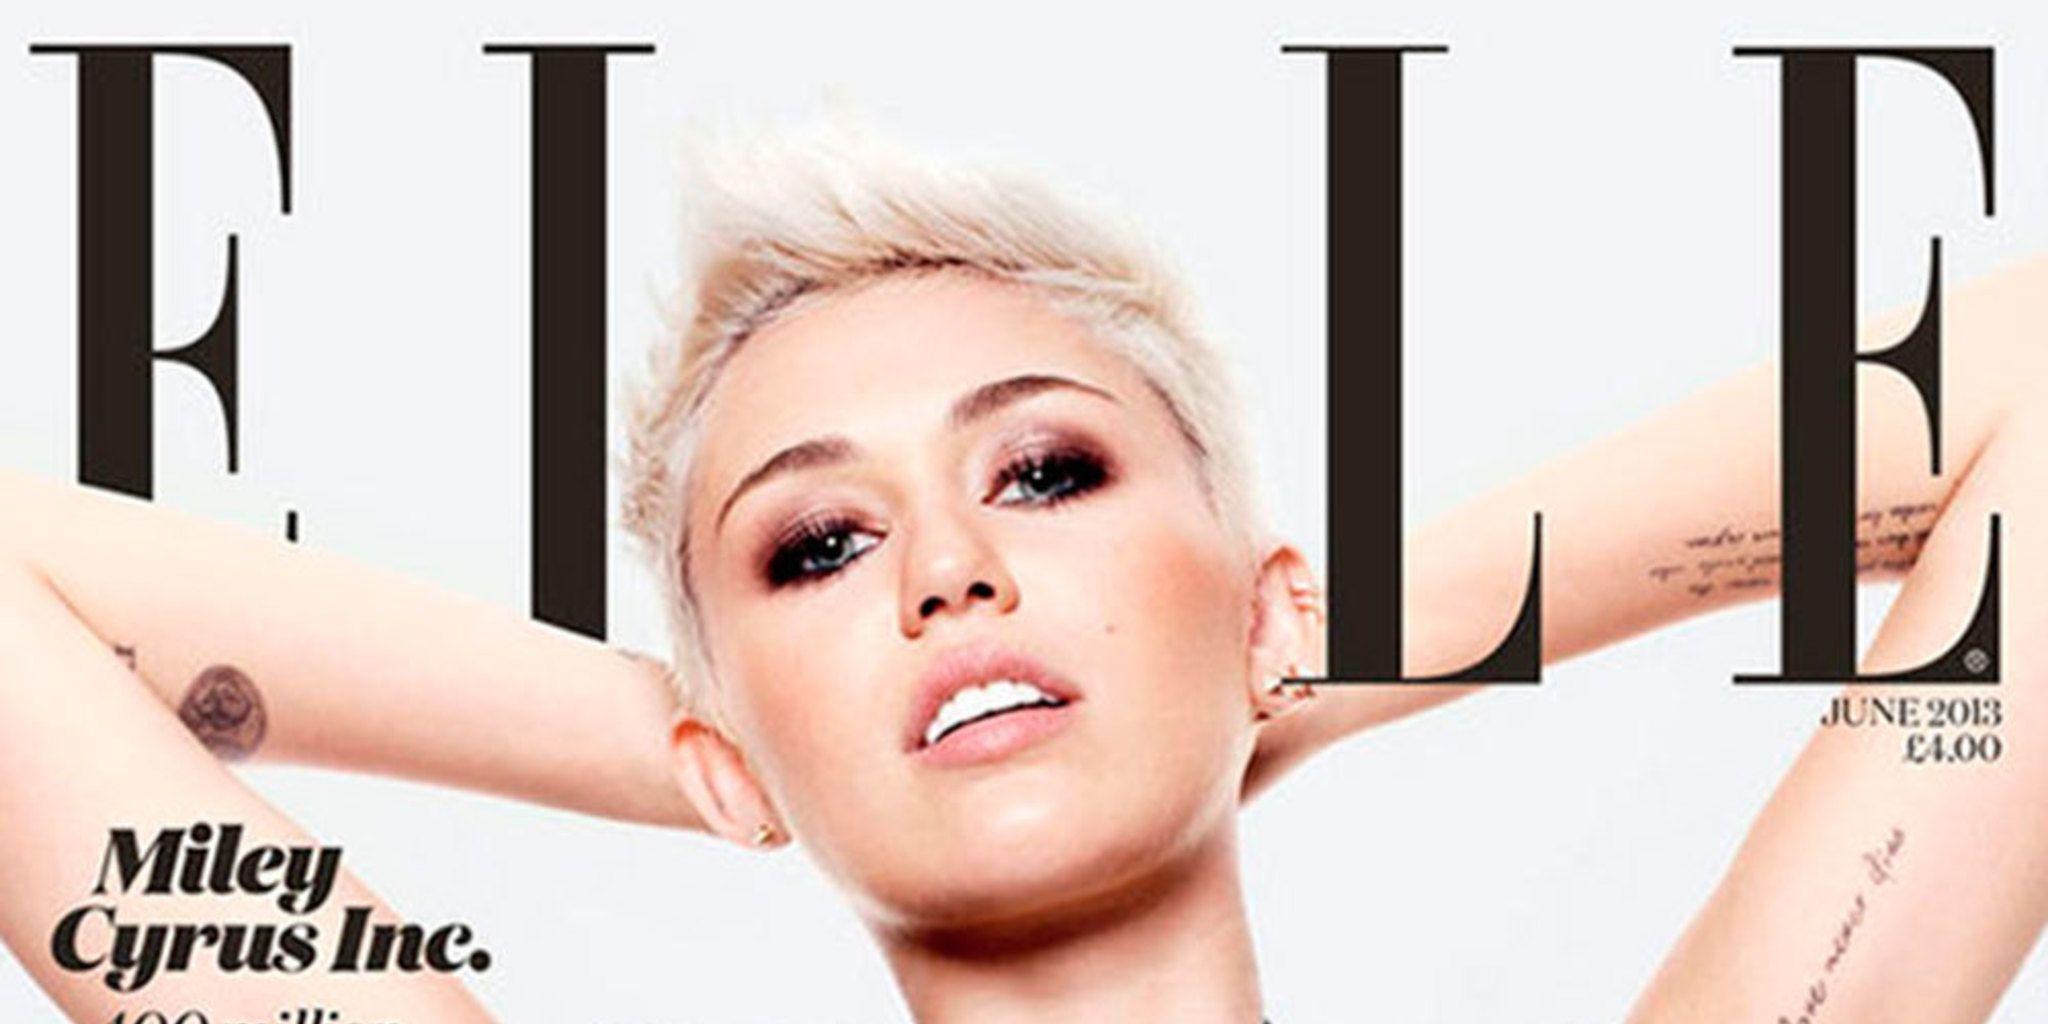 Miley cirus hannah montana